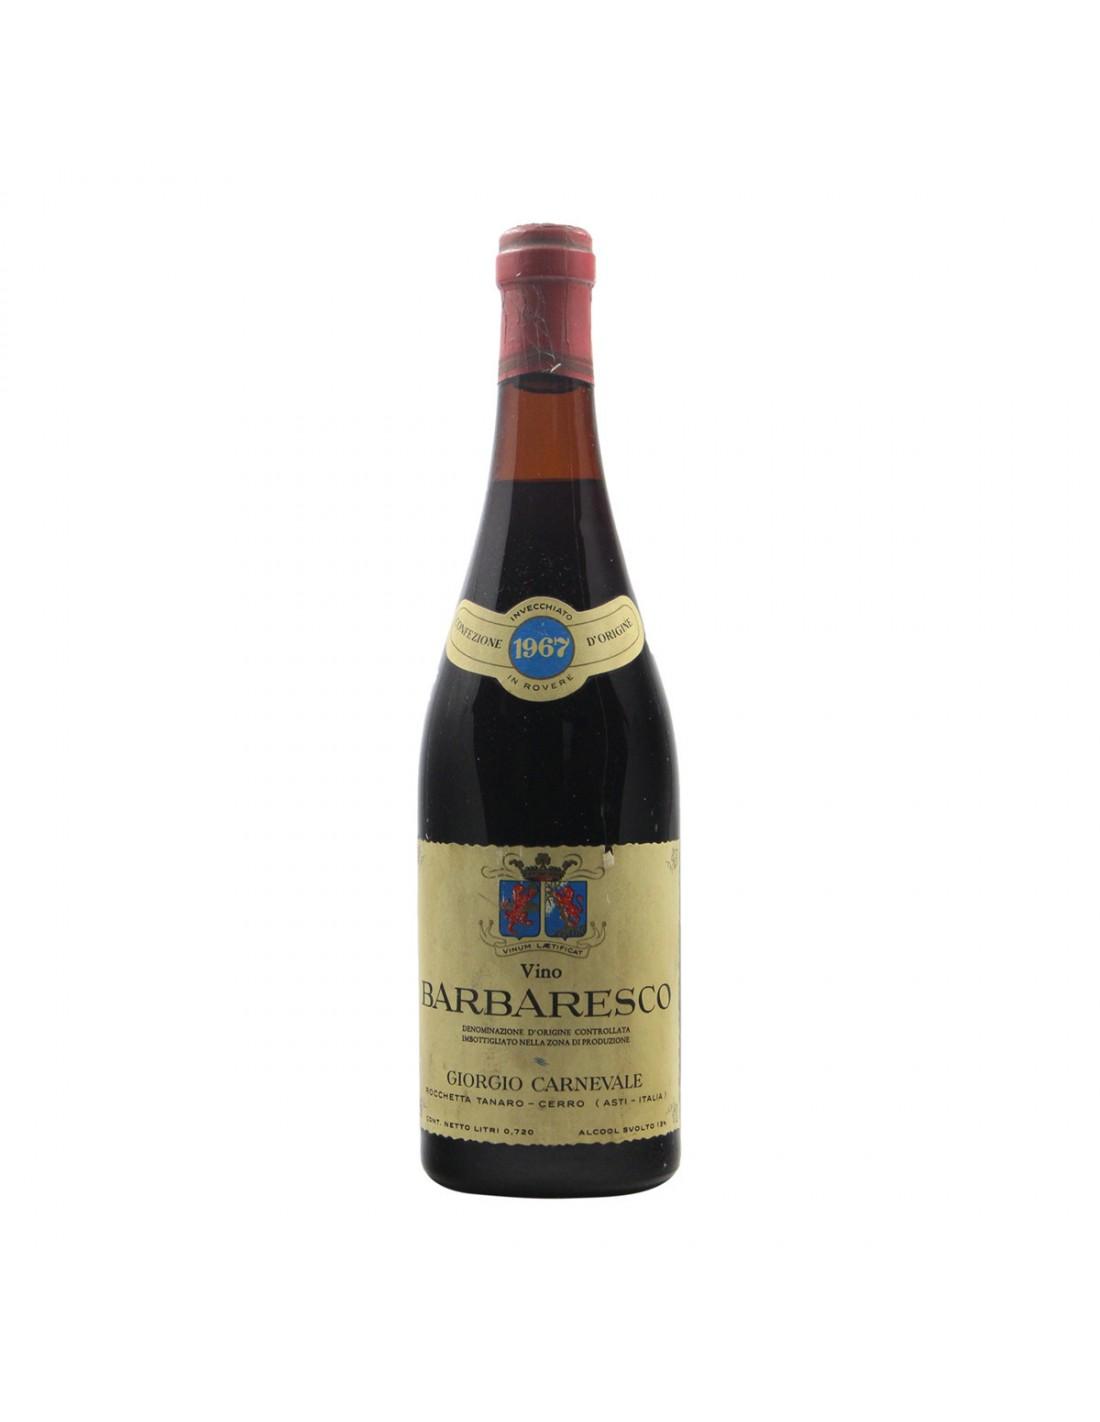 BARBARESCO 1967 GIORGIO CARNEVALE Grandi Bottiglie